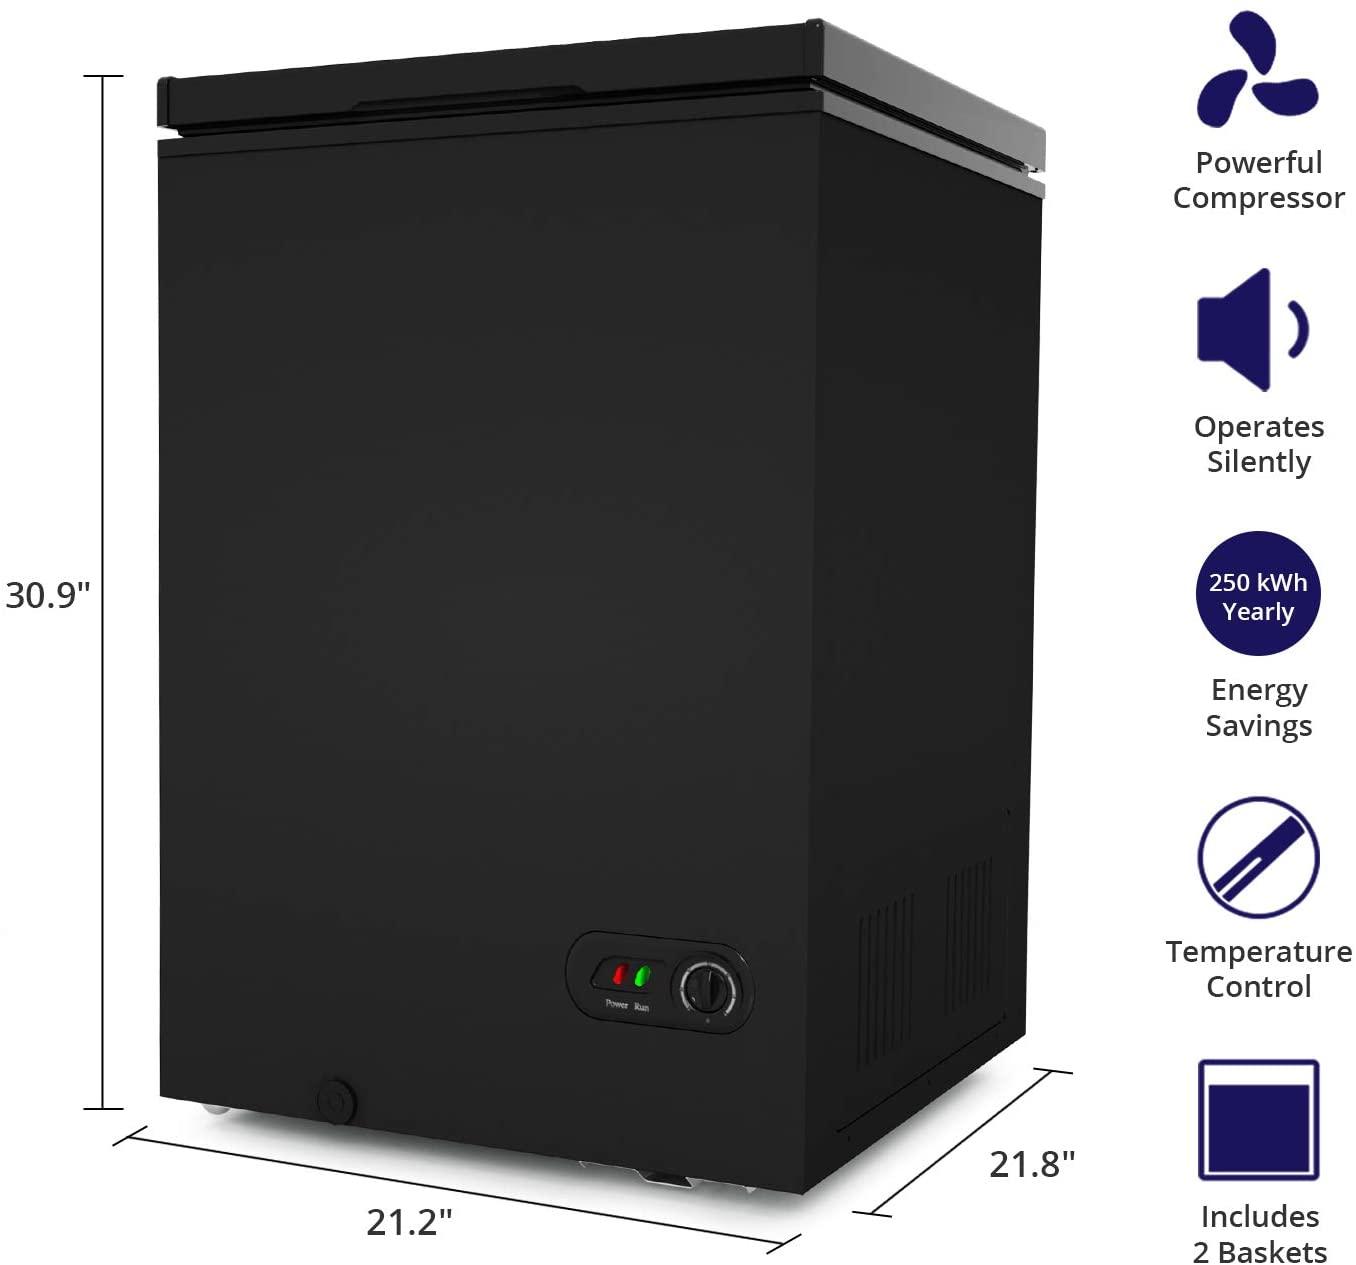 Northair 3.5 Cu Ft Chest Freezer  Specs